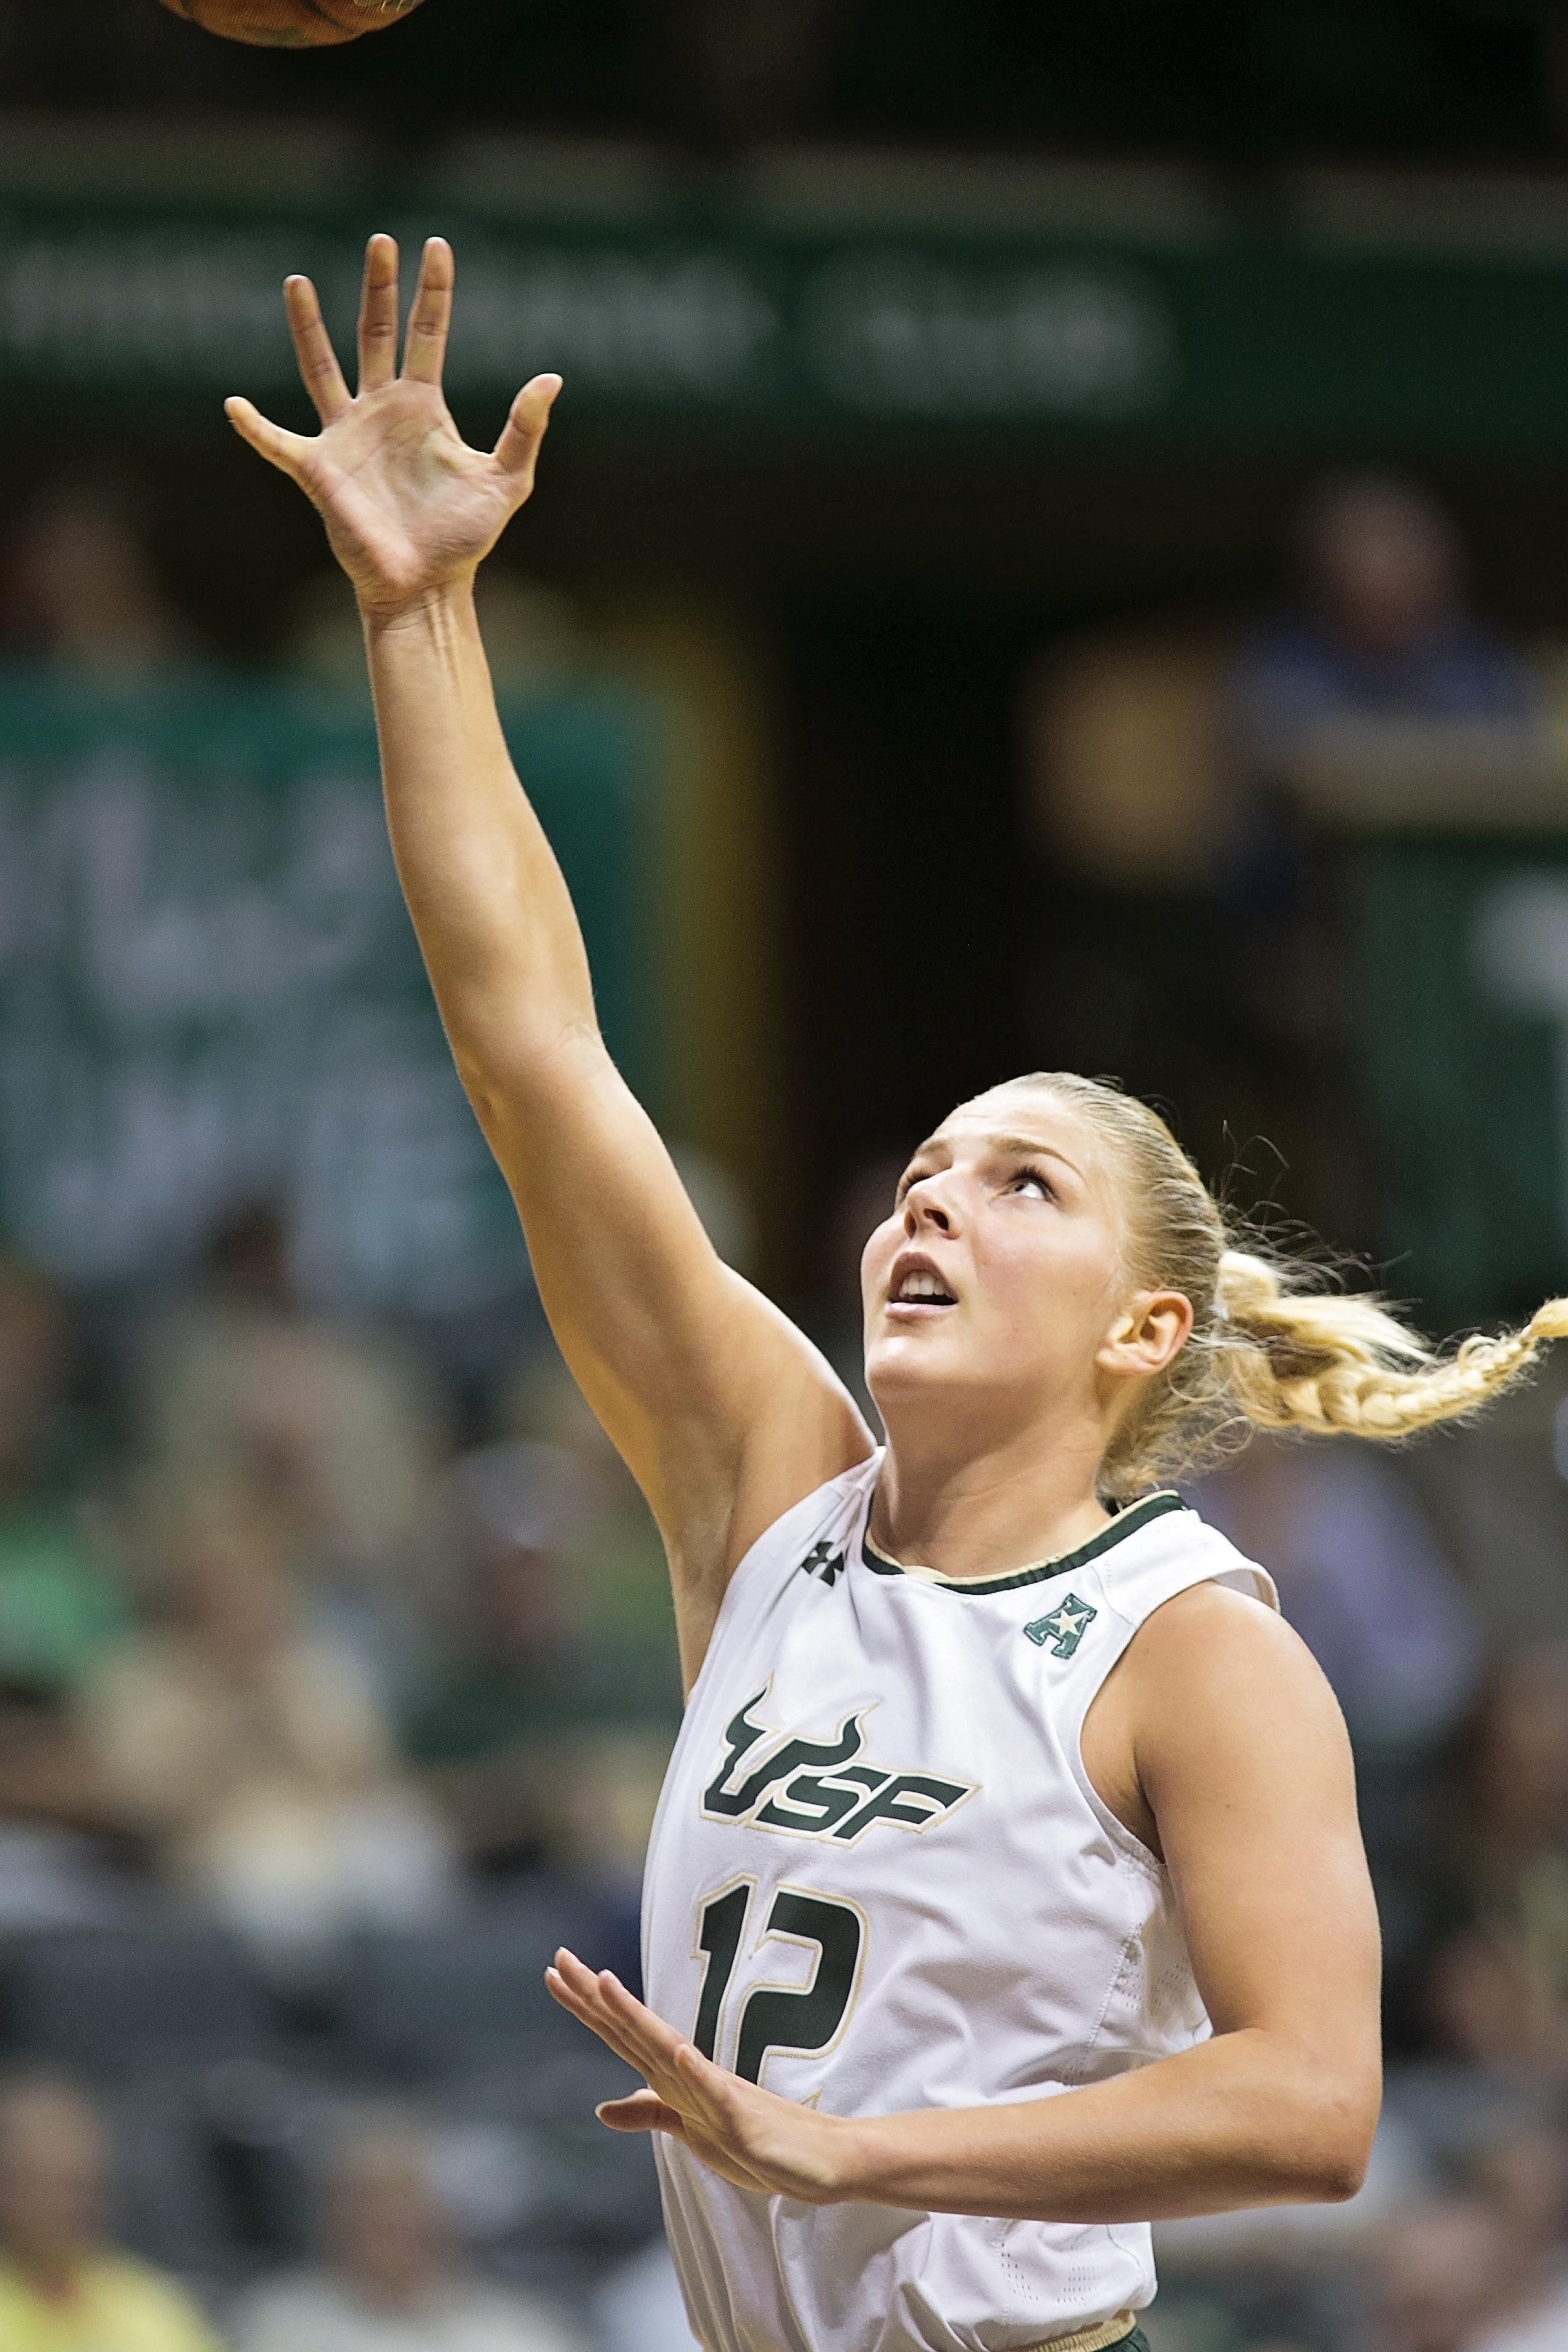 Jespersen had her 16th double-double of the season./CARMEN MANDATO